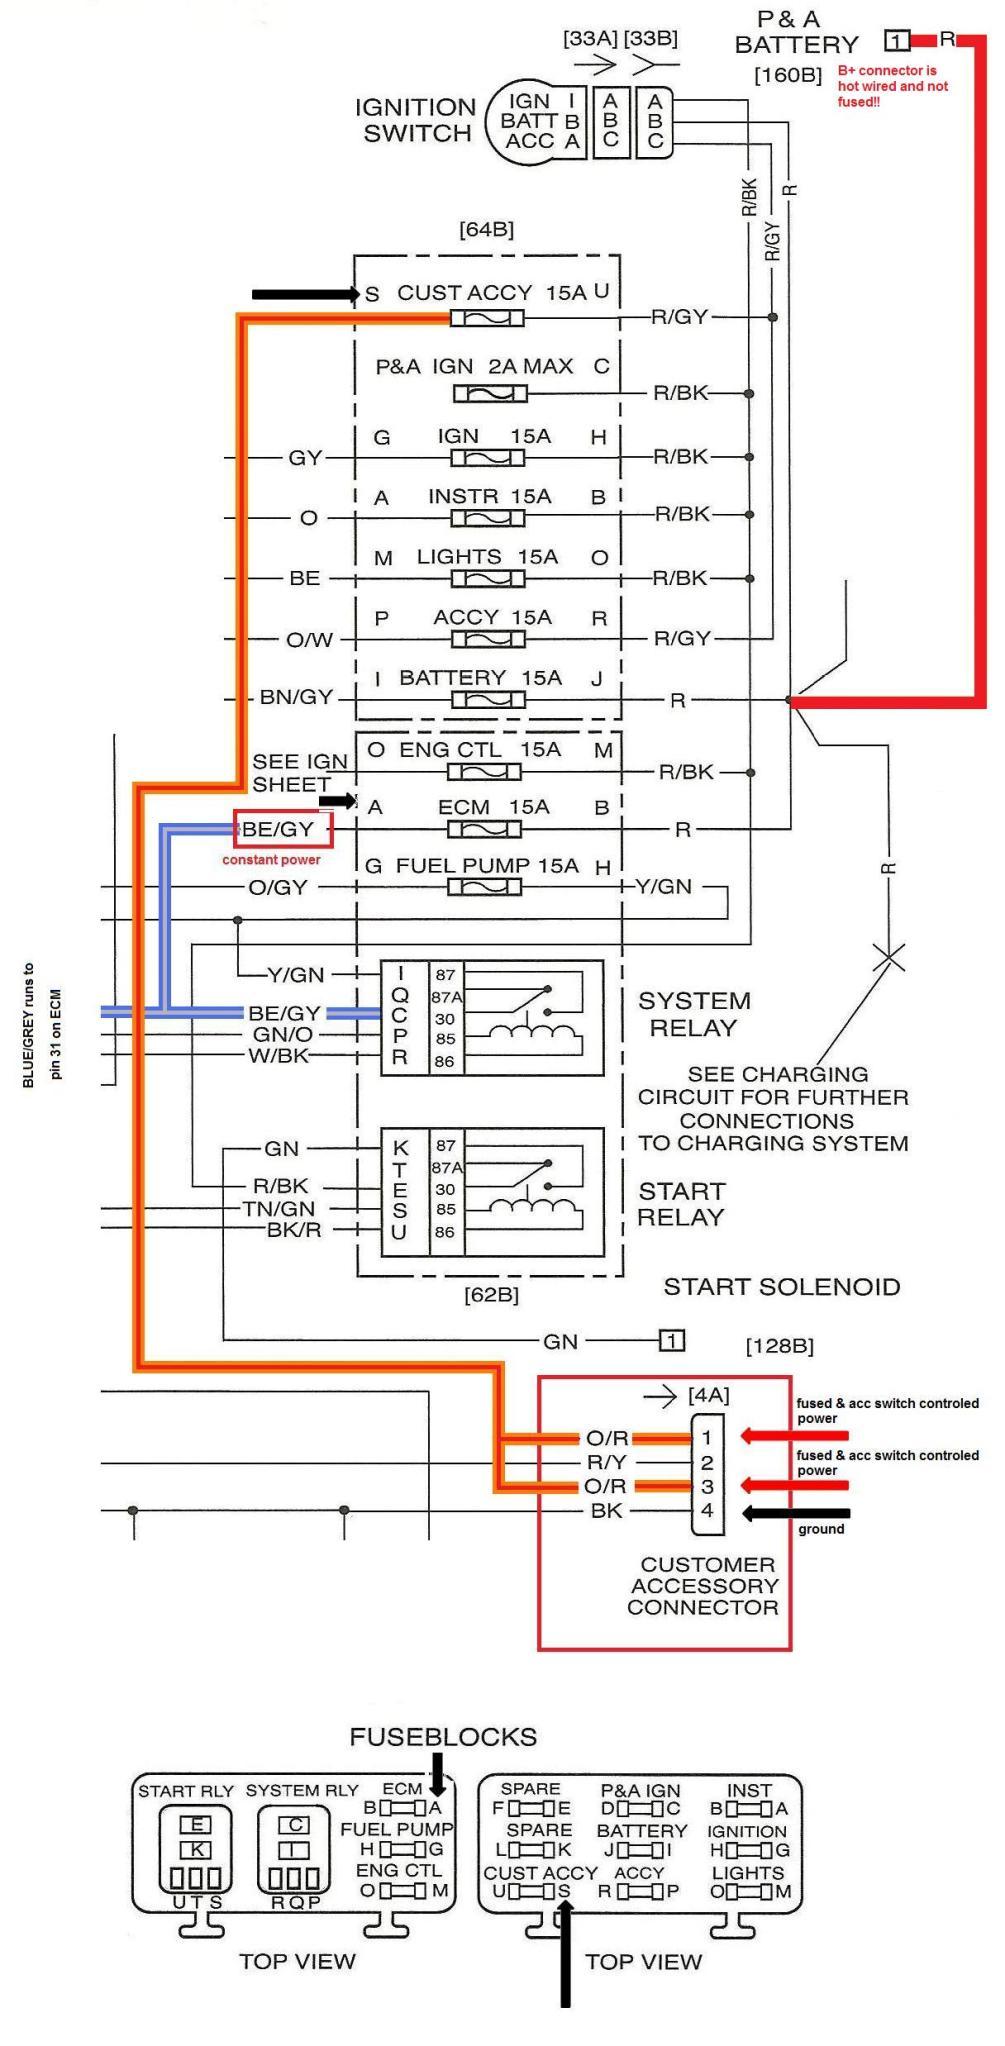 [SCHEMATICS_48EU]  Harley Davidson Wiring Diagrams Fuse 06 Dodge Ram Mega Cab Fuse Box -  wearing.crv.the-rocks.it | 2007 Sportster Wiring Diagram |  | Bege Wiring Diagram Source Full Edition